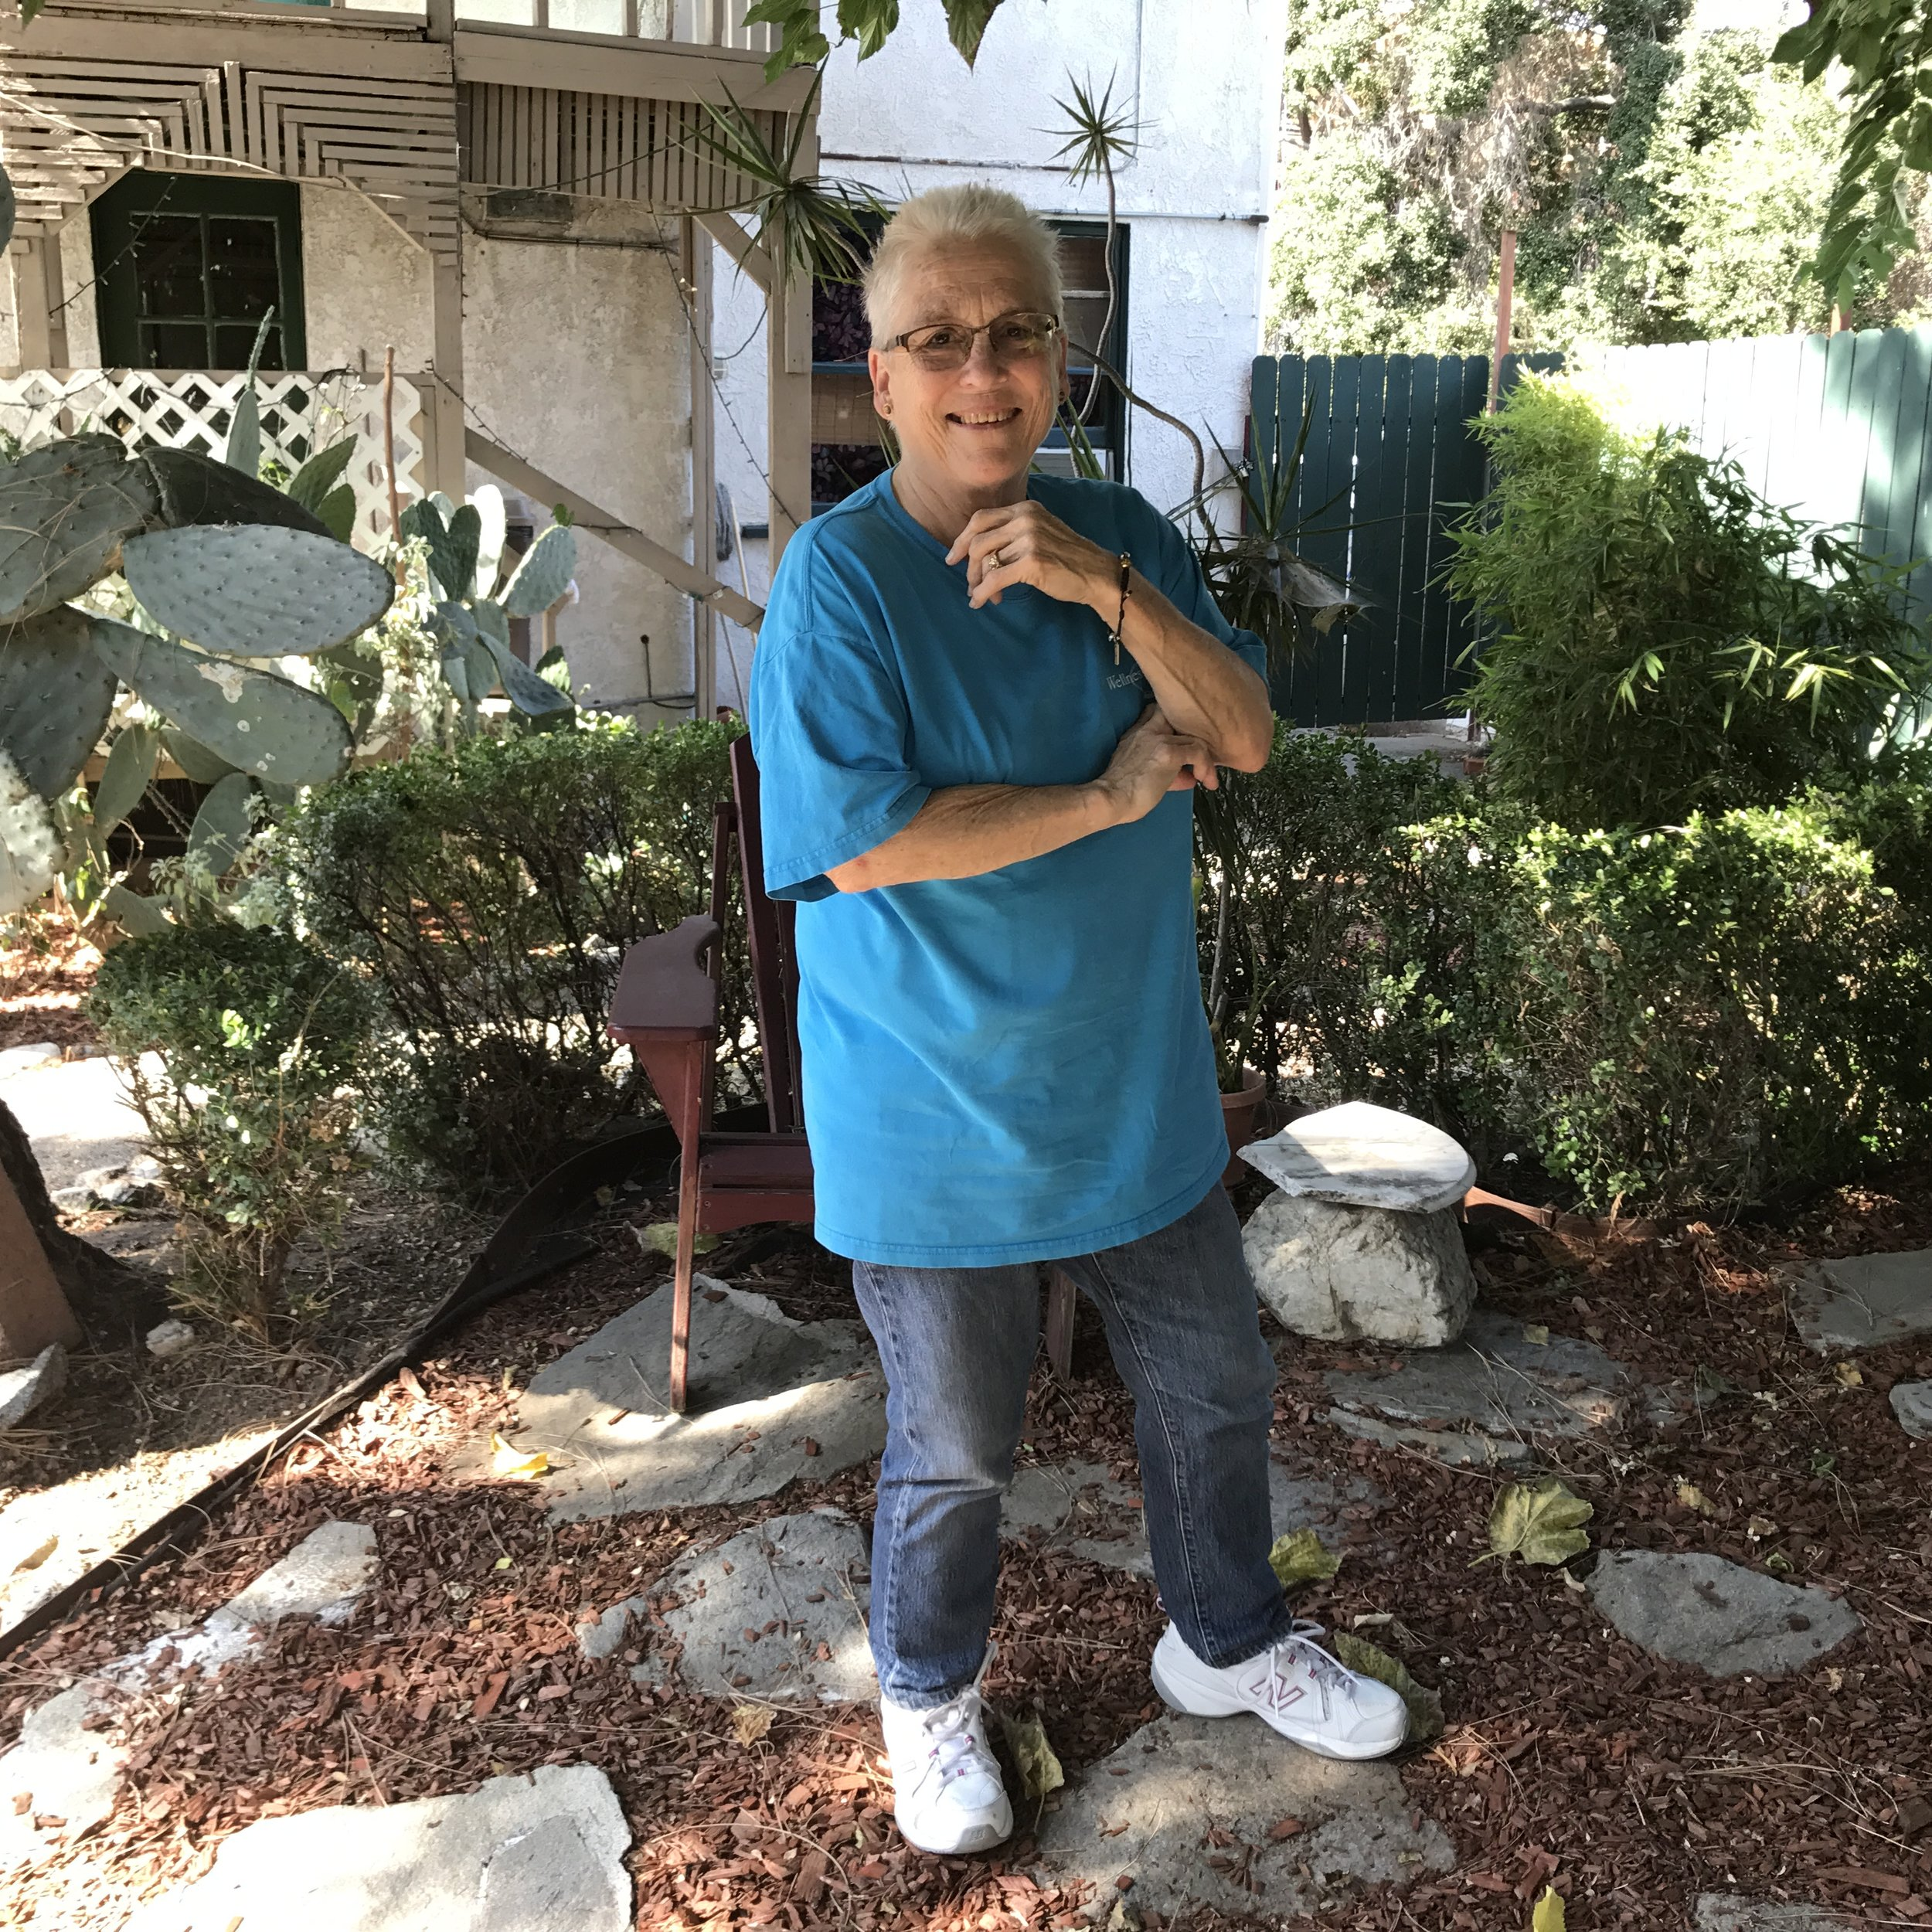 Kathy Lynch. Glendale, California.July 8, 2017.